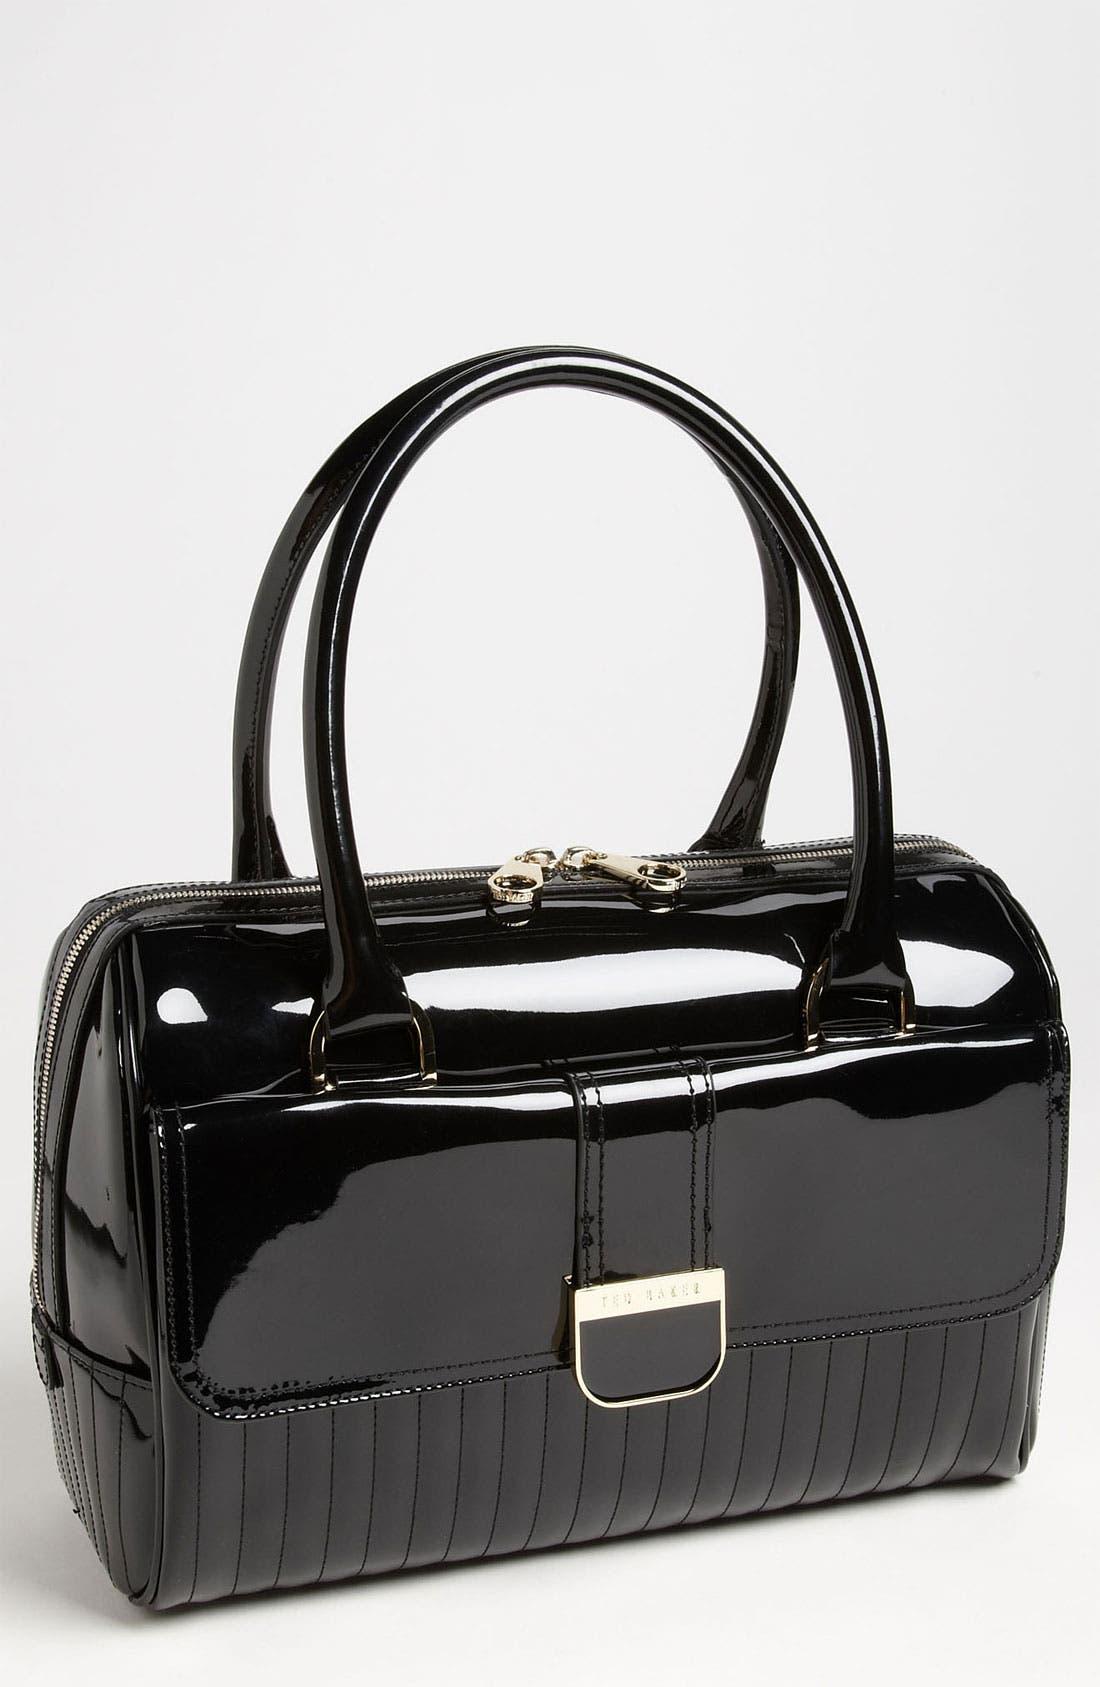 Main Image - Ted Baker London 'Enamel' Quilted Bowler Bag